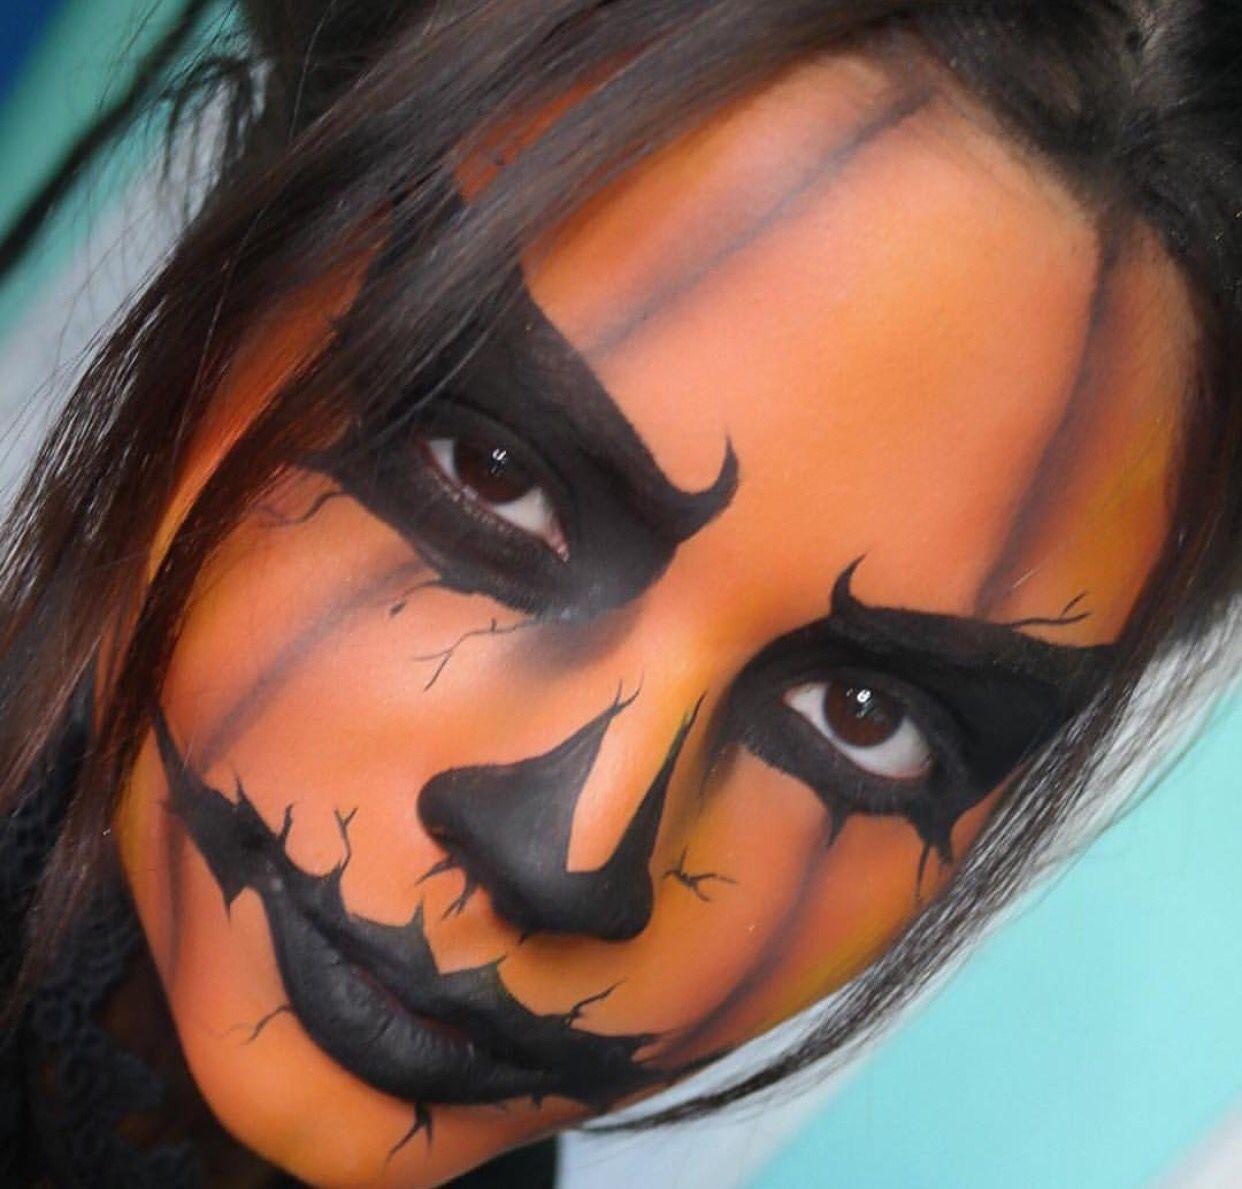 Amandajhayden Halloween Makeup Jack O Lantern Pumpkin Makeup Artist -   11 pumpkin makeup Halloween ideas